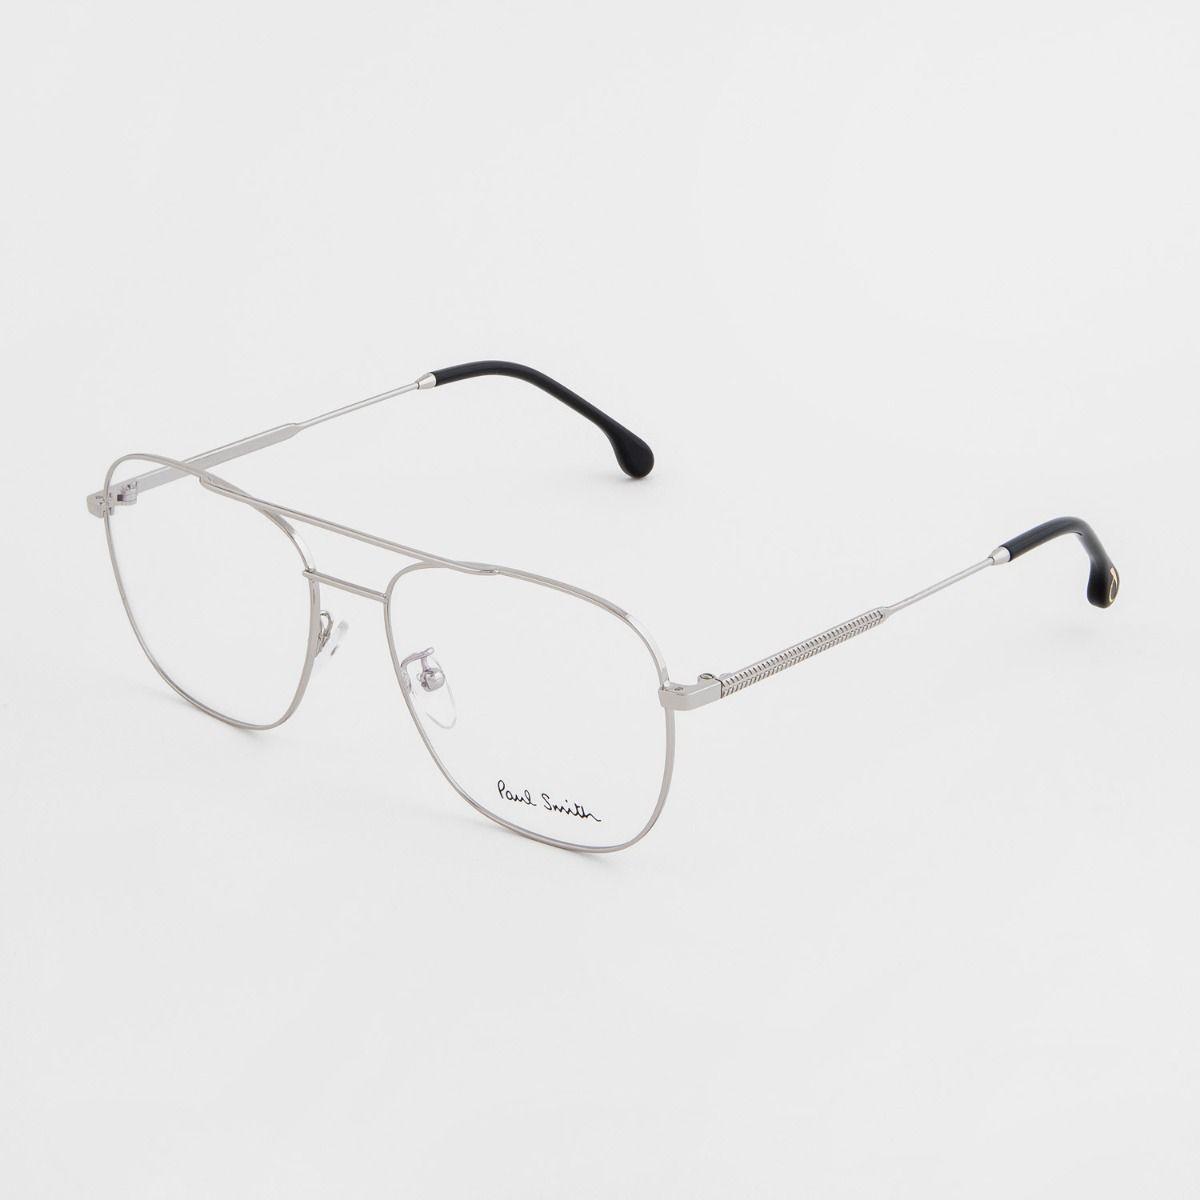 Paul Smith Avery Optical Aviator Glasses